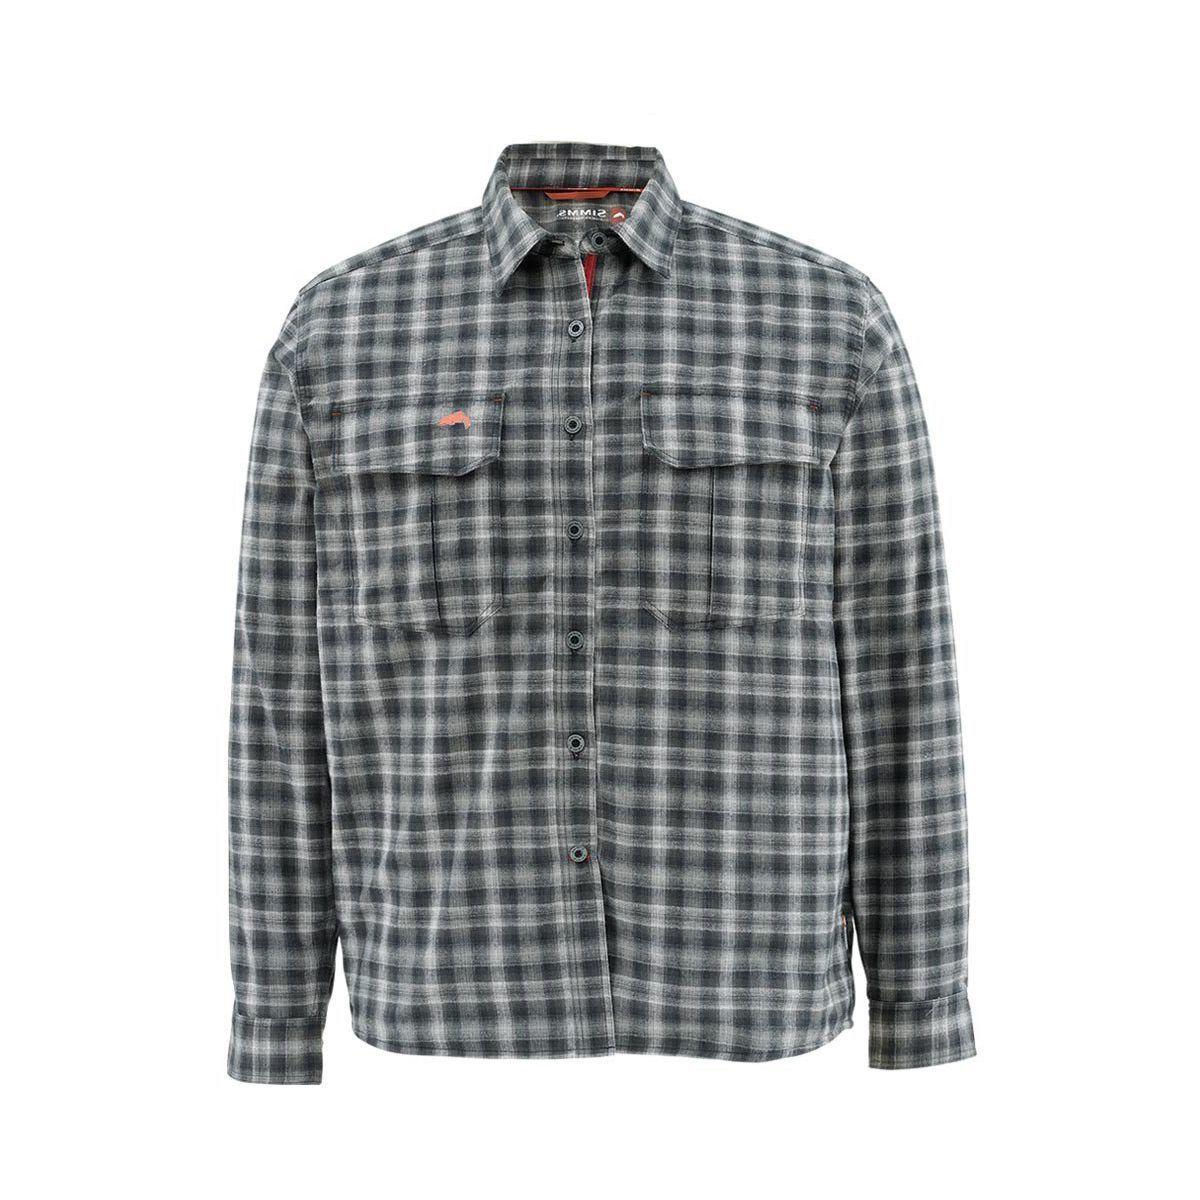 Simms Cold Weather Shirt - Men's